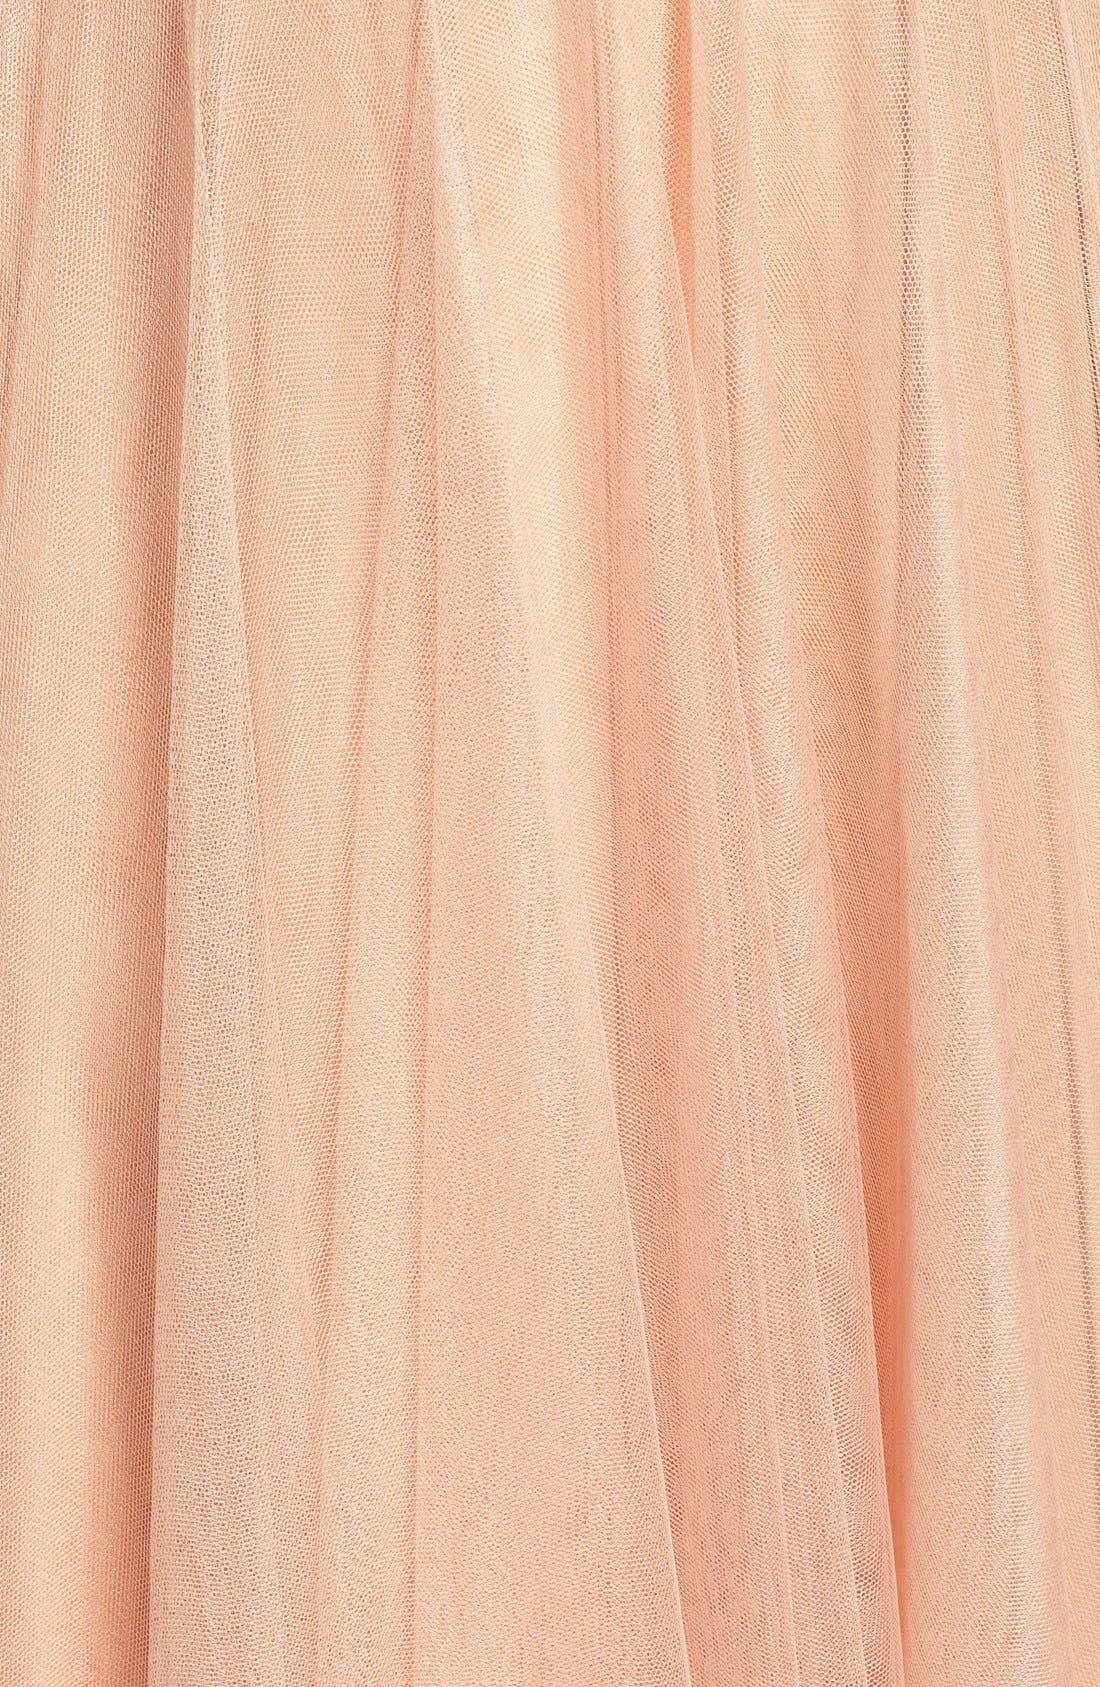 Brielle Tulle Gown,                             Alternate thumbnail 2, color,                             685